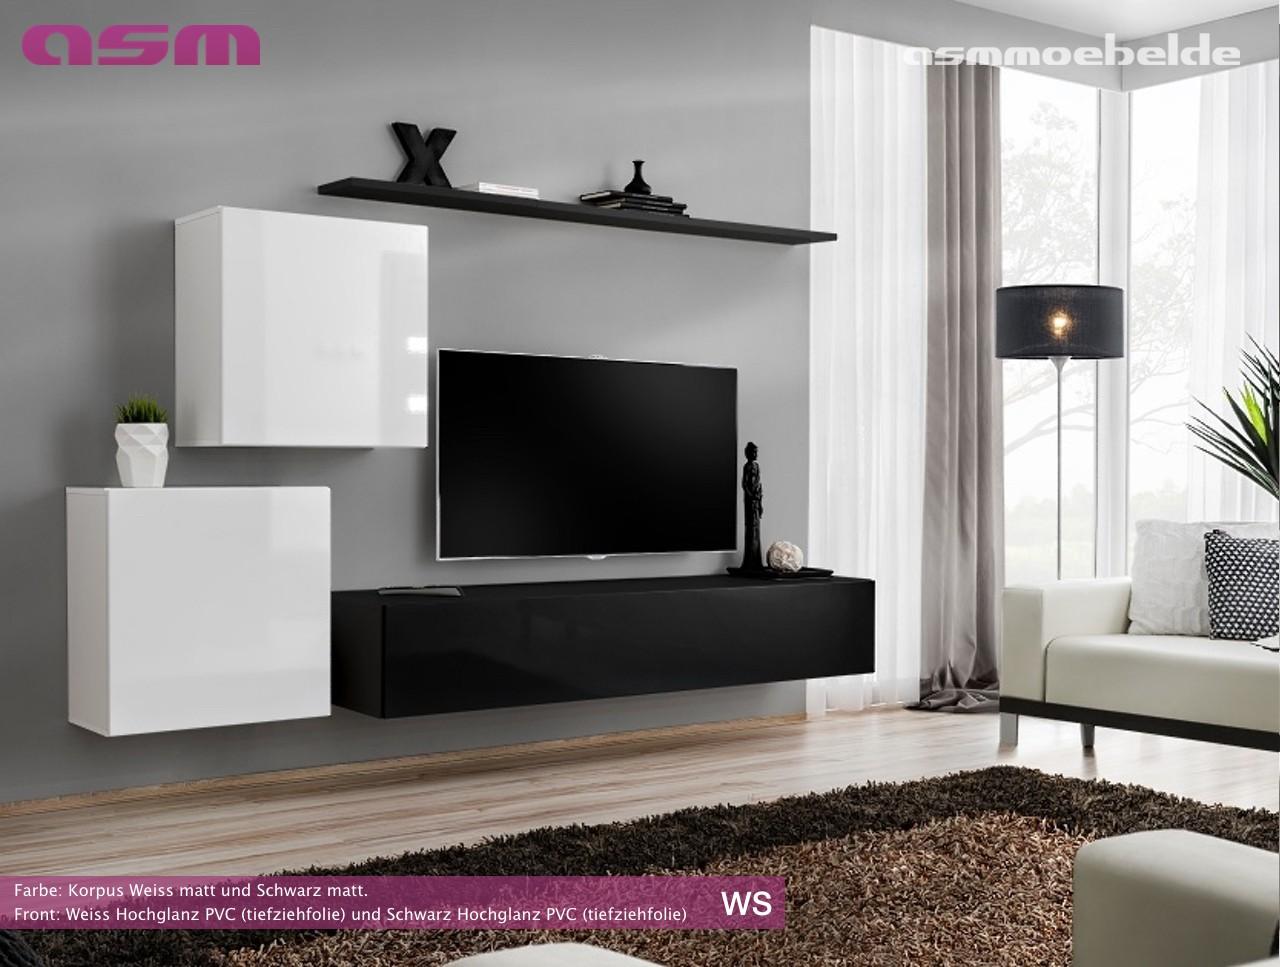 V Modern Furniture. Modern Wall TV Display Living Room Unit High Gloss  Furniture SWITCH V